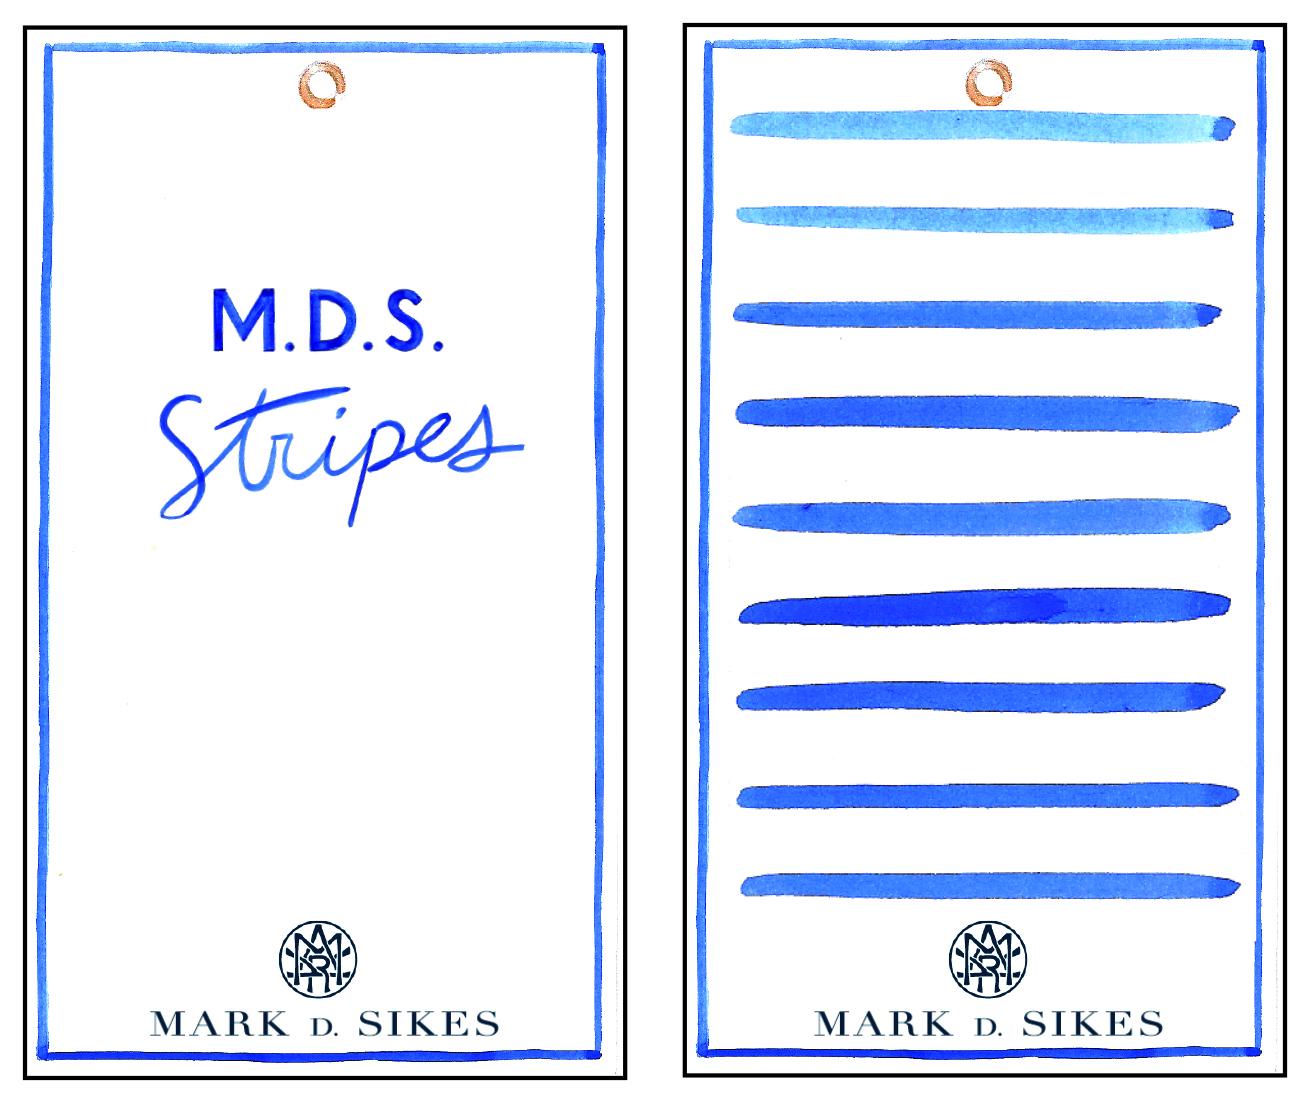 2 MDS stripes hangtag.jpg